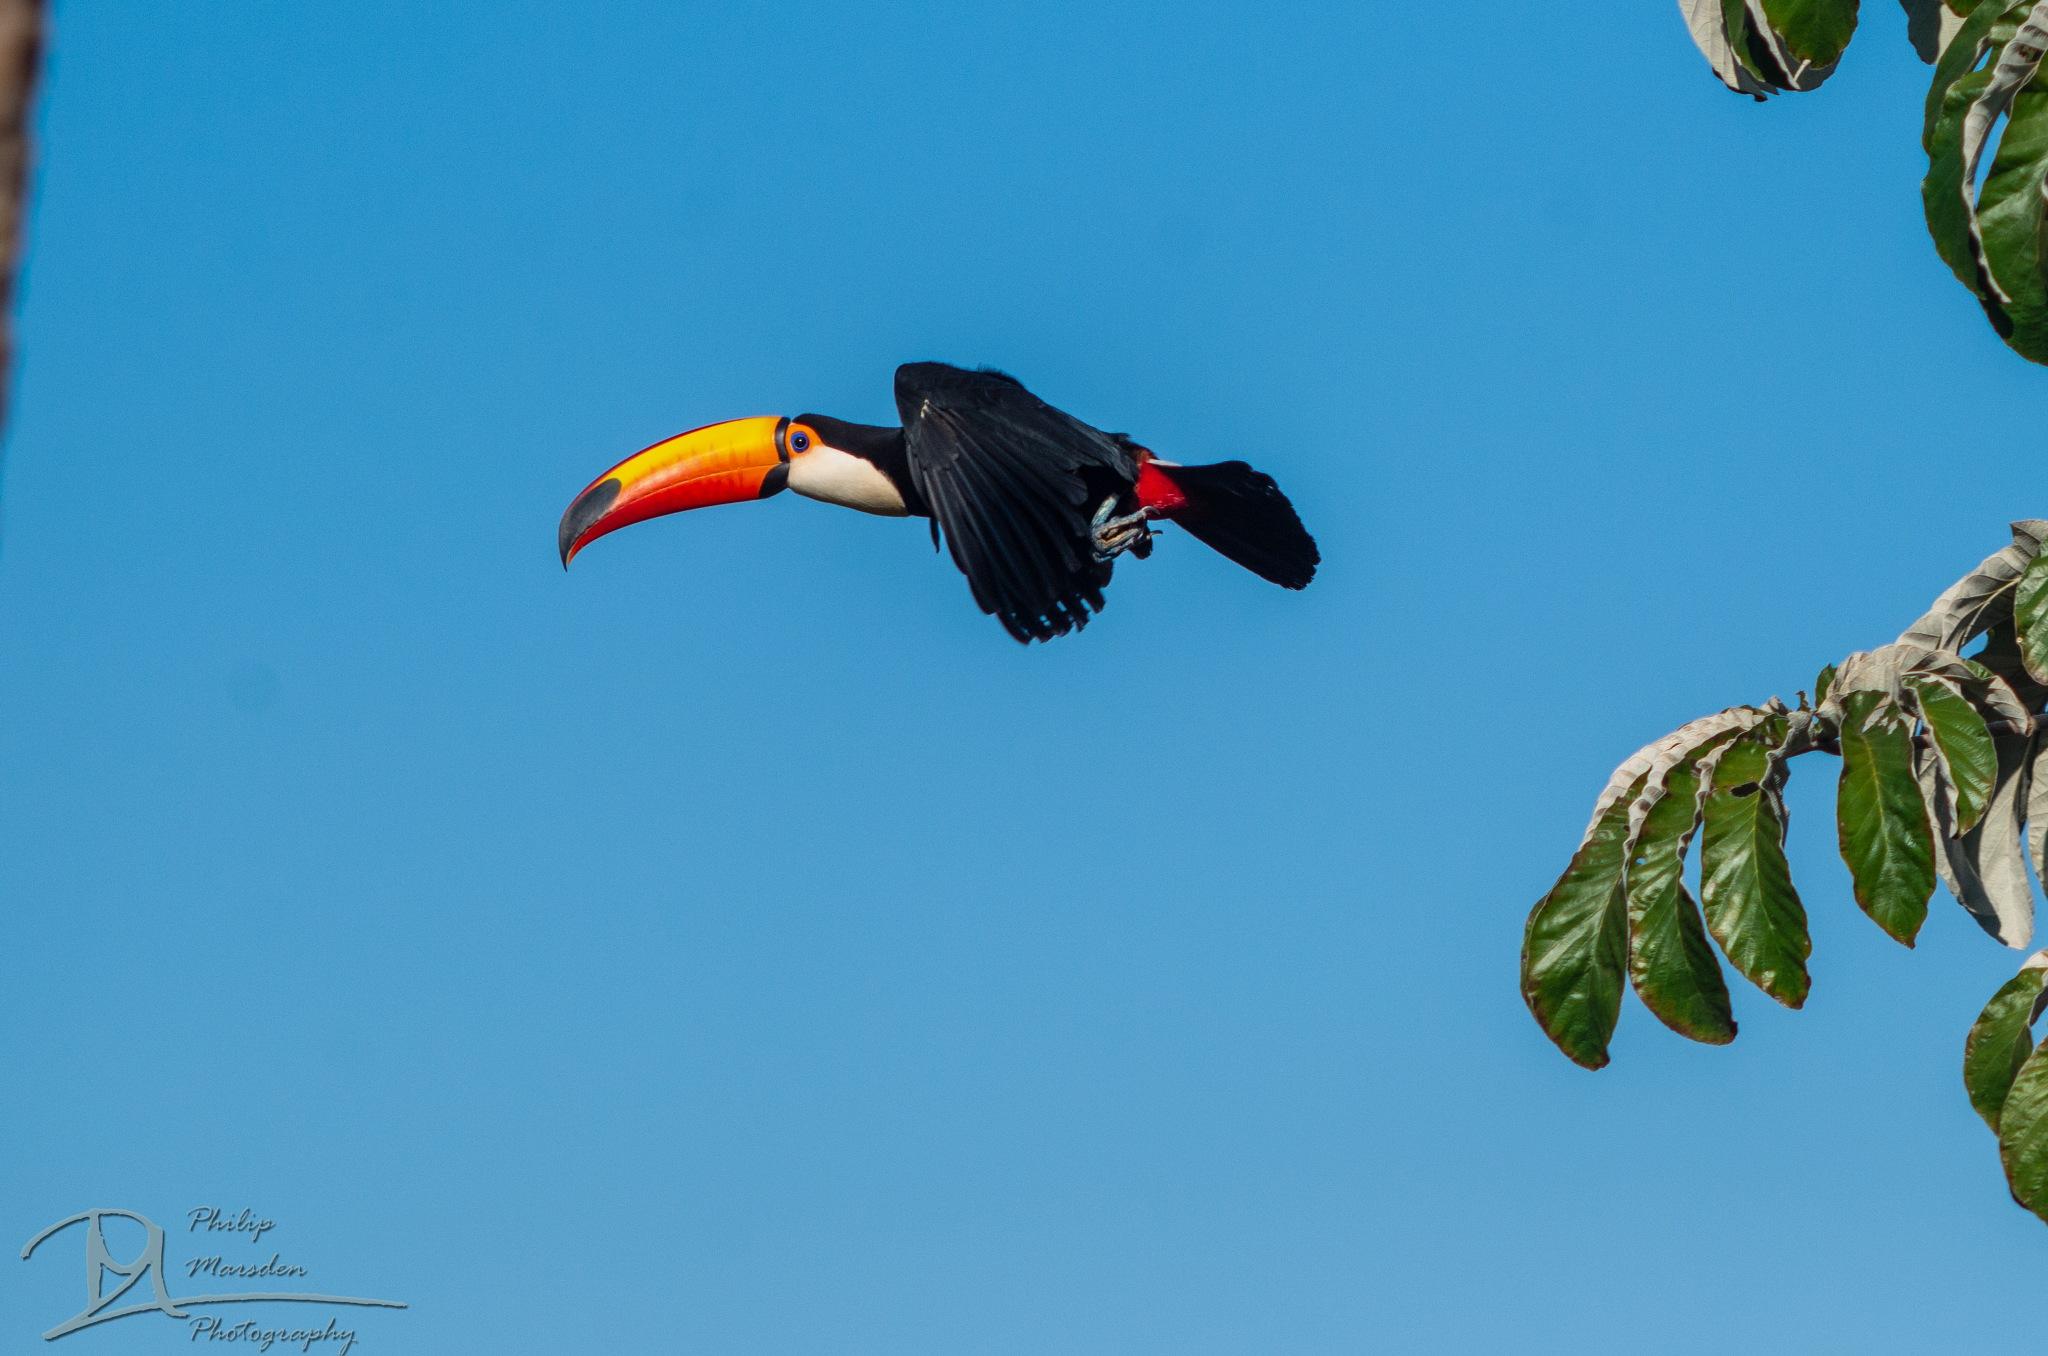 Toucan in flight by Philip Marsden